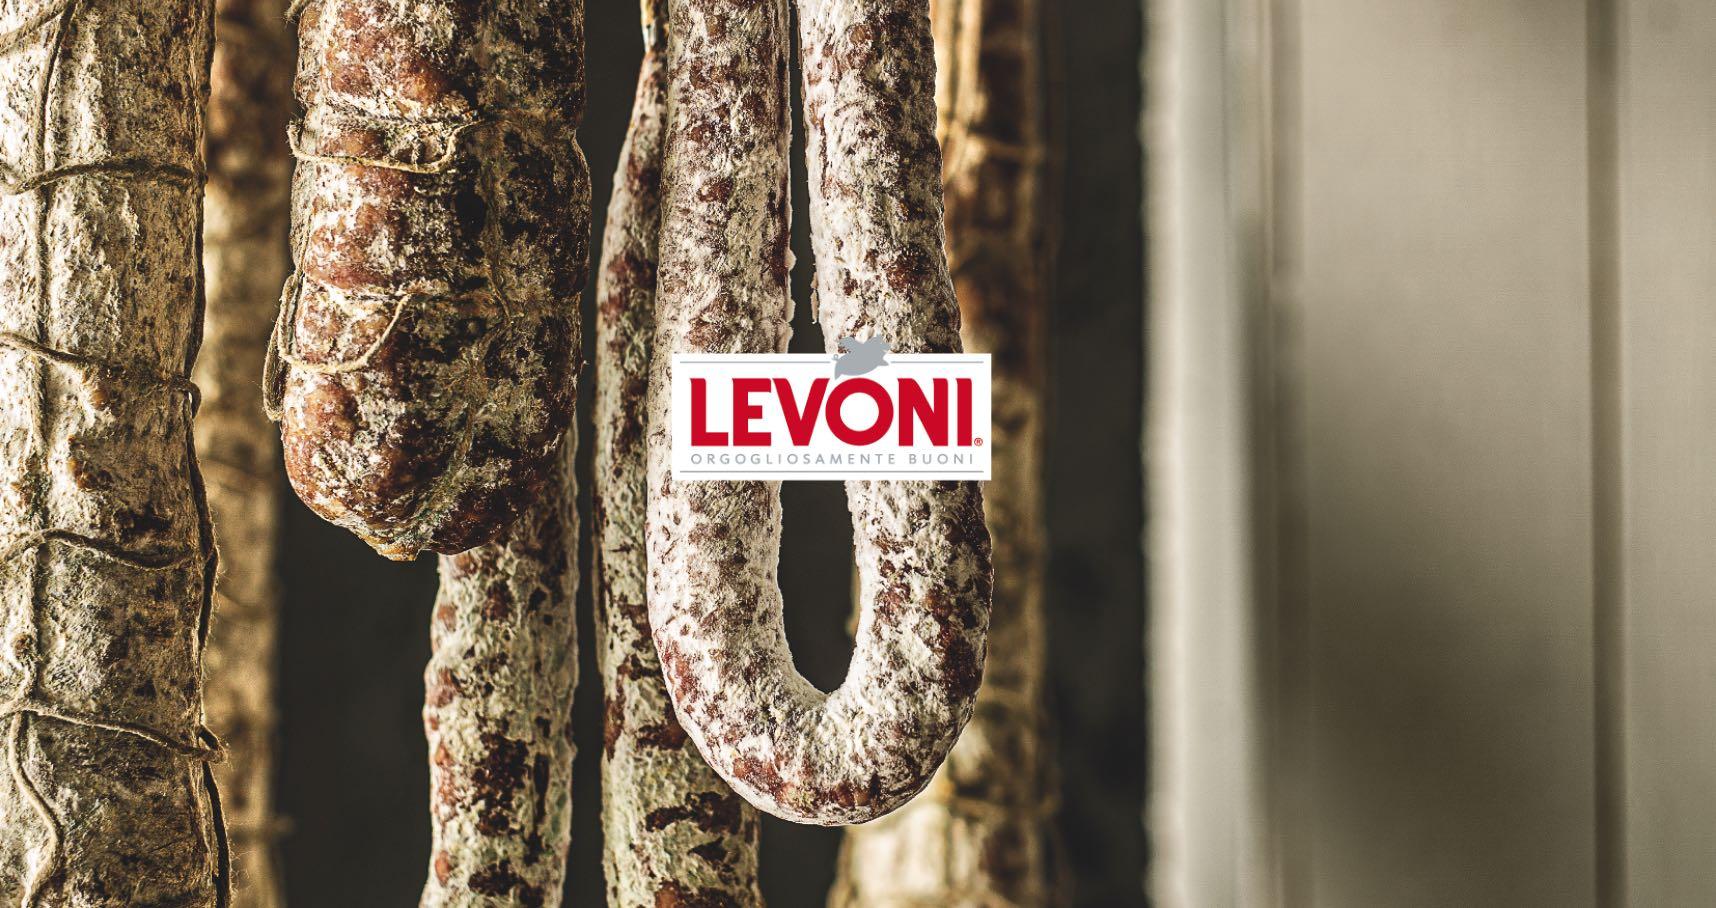 Levoni